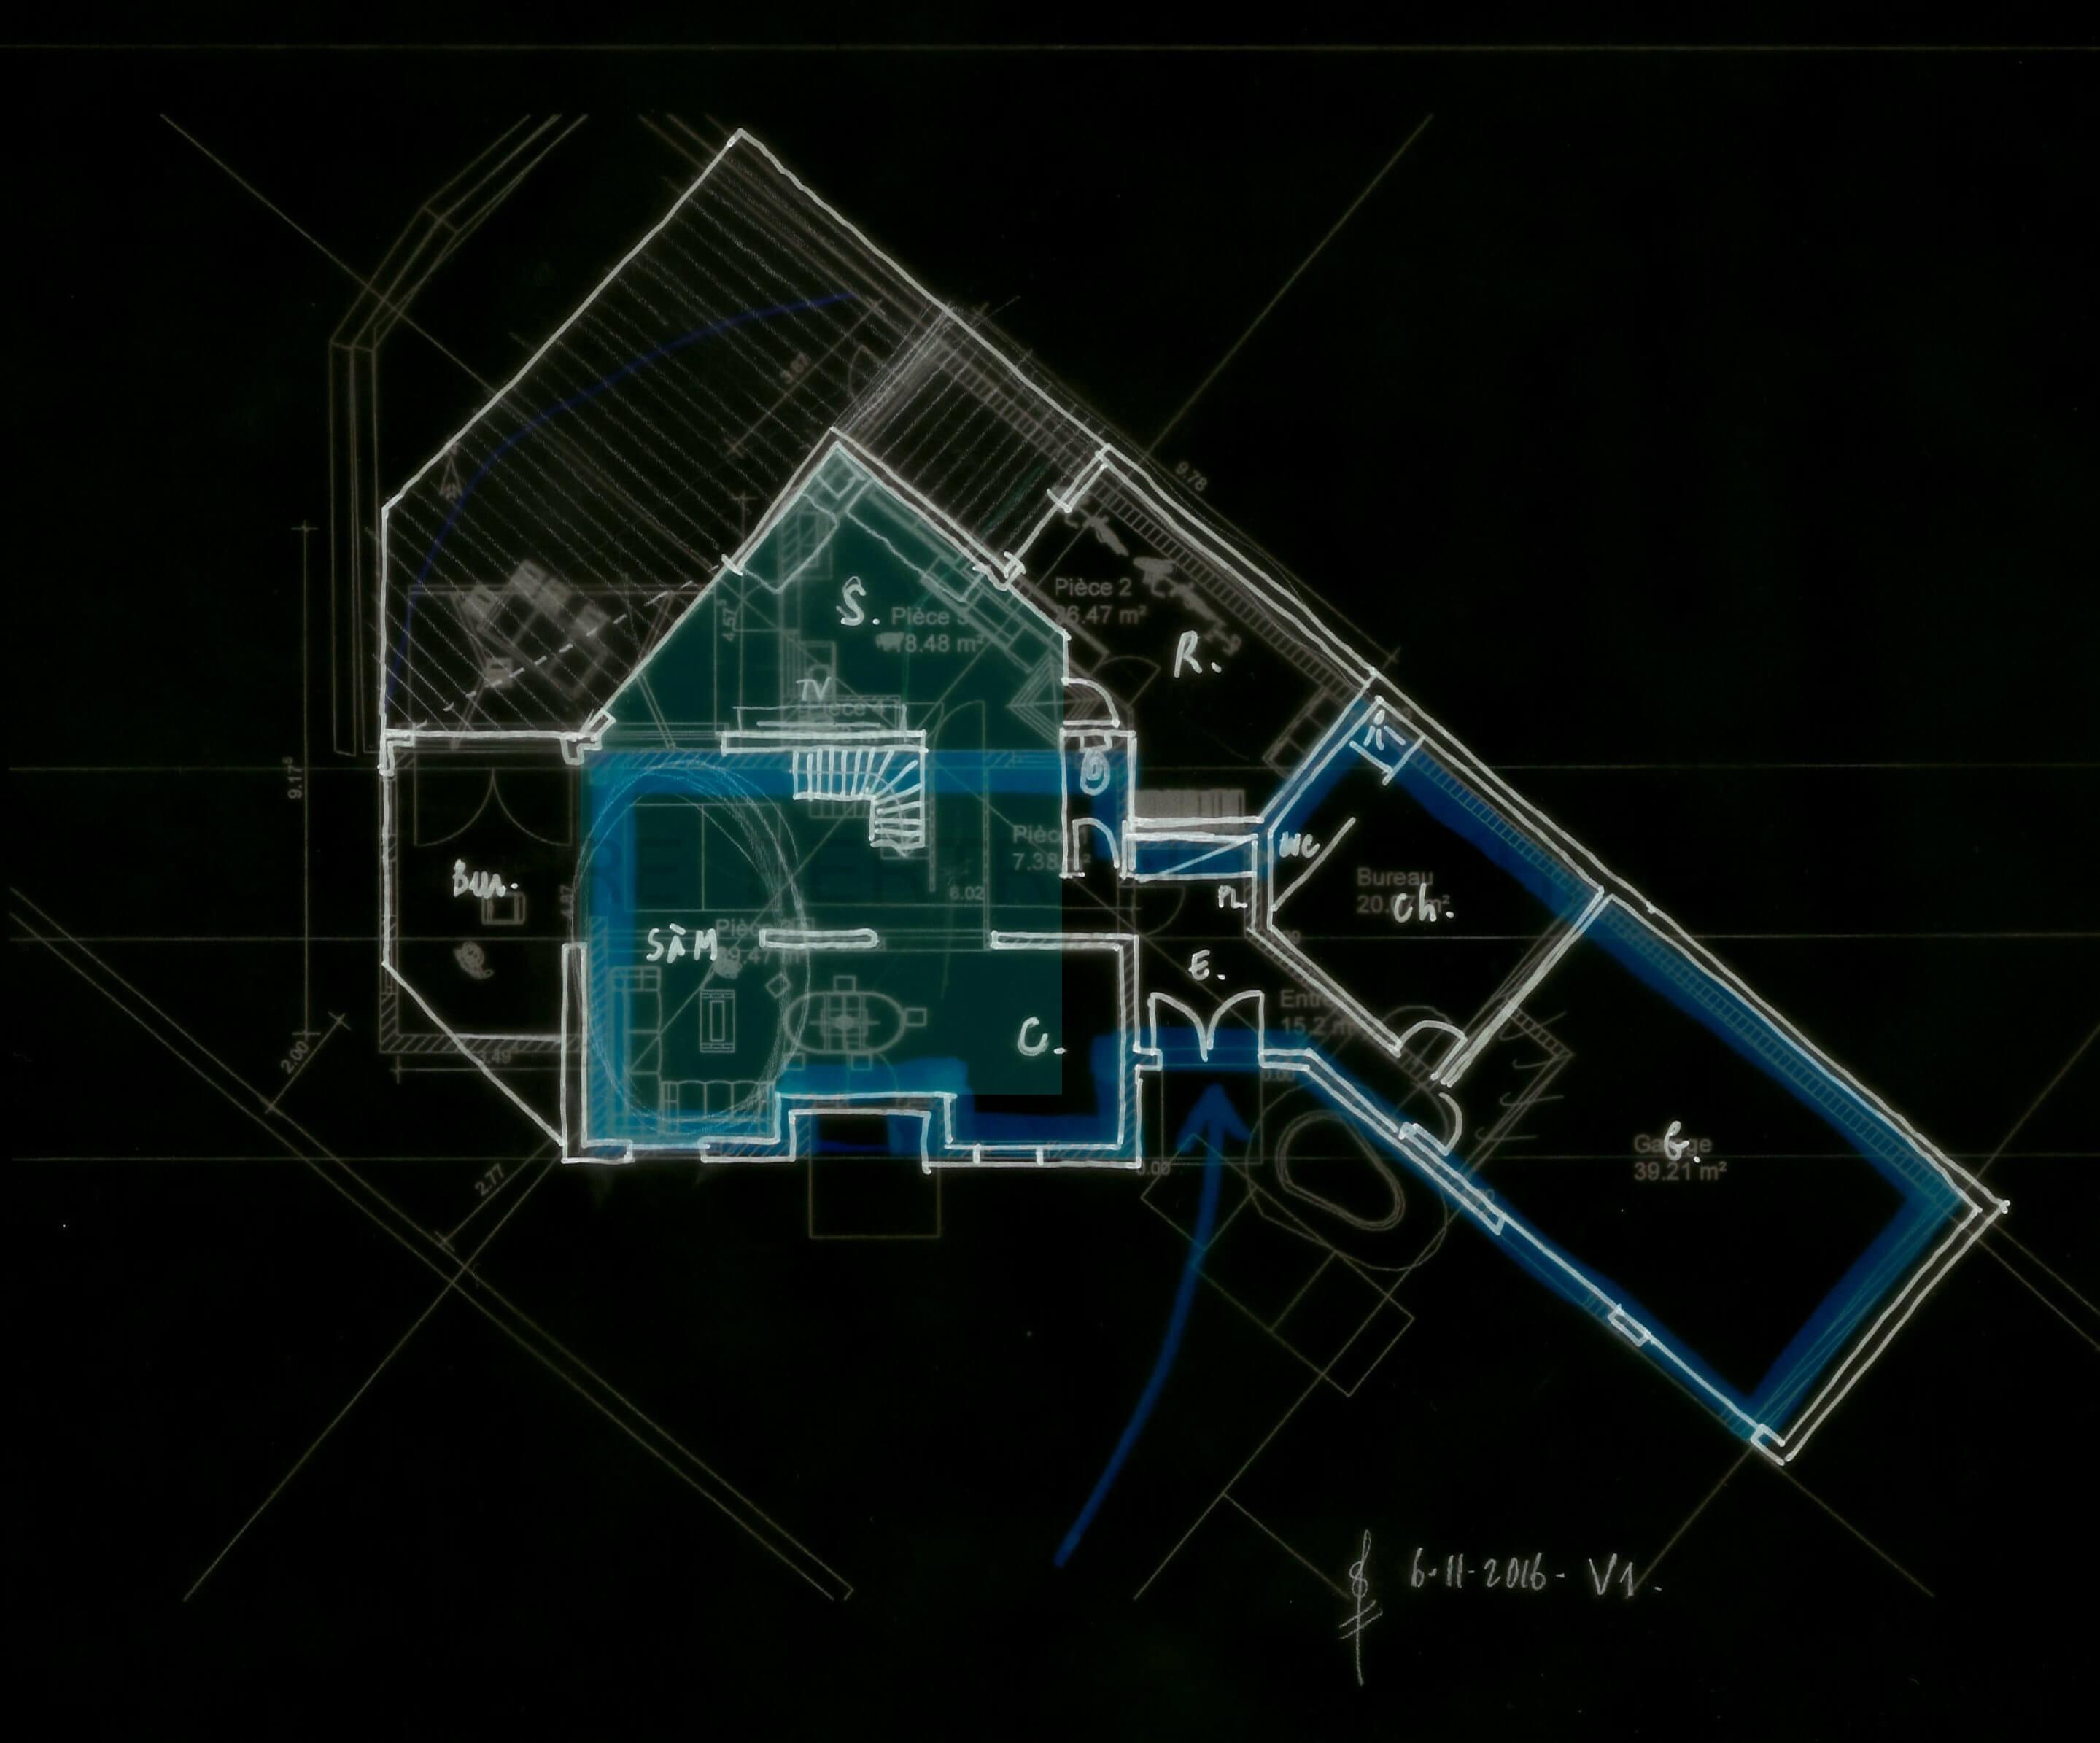 2017 02 02 (2016-015) 003 - Plan projet